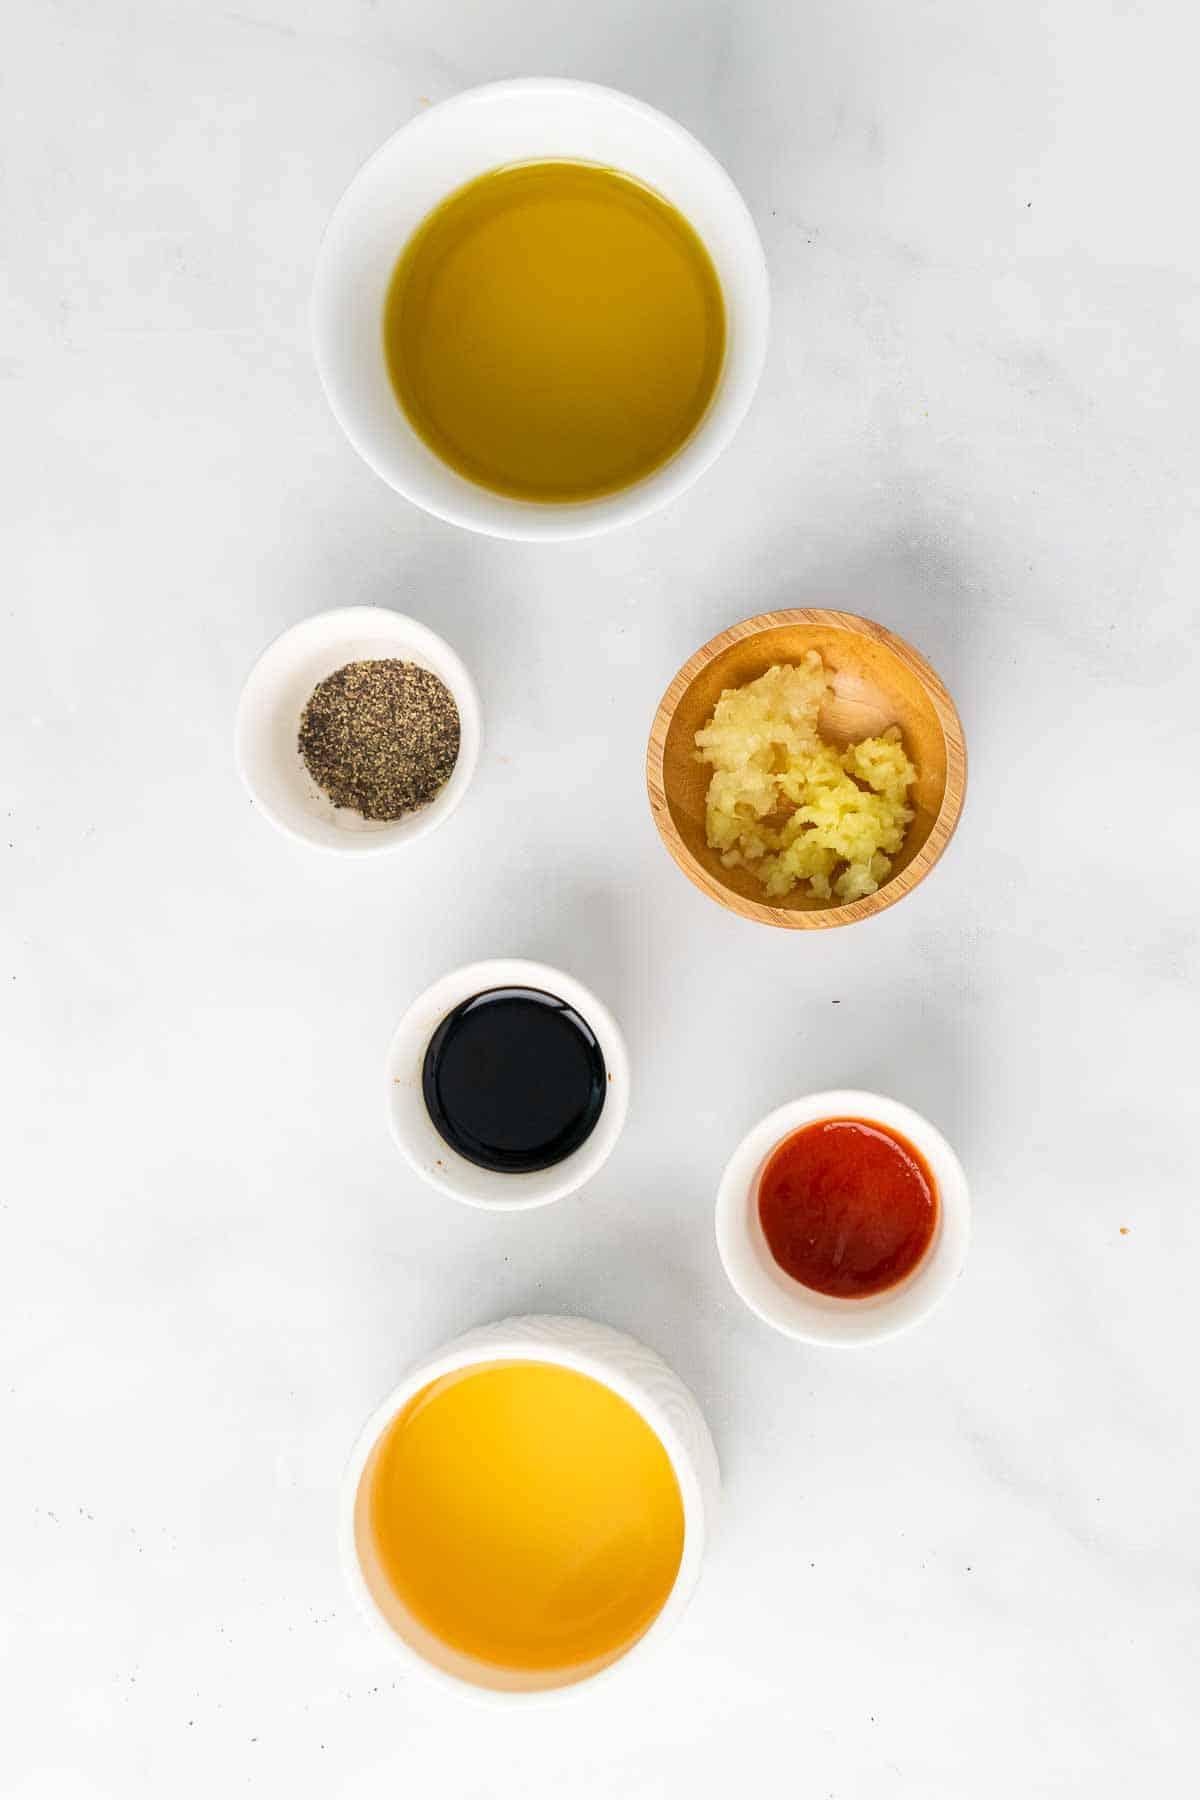 Ingredients in individual white ramekins